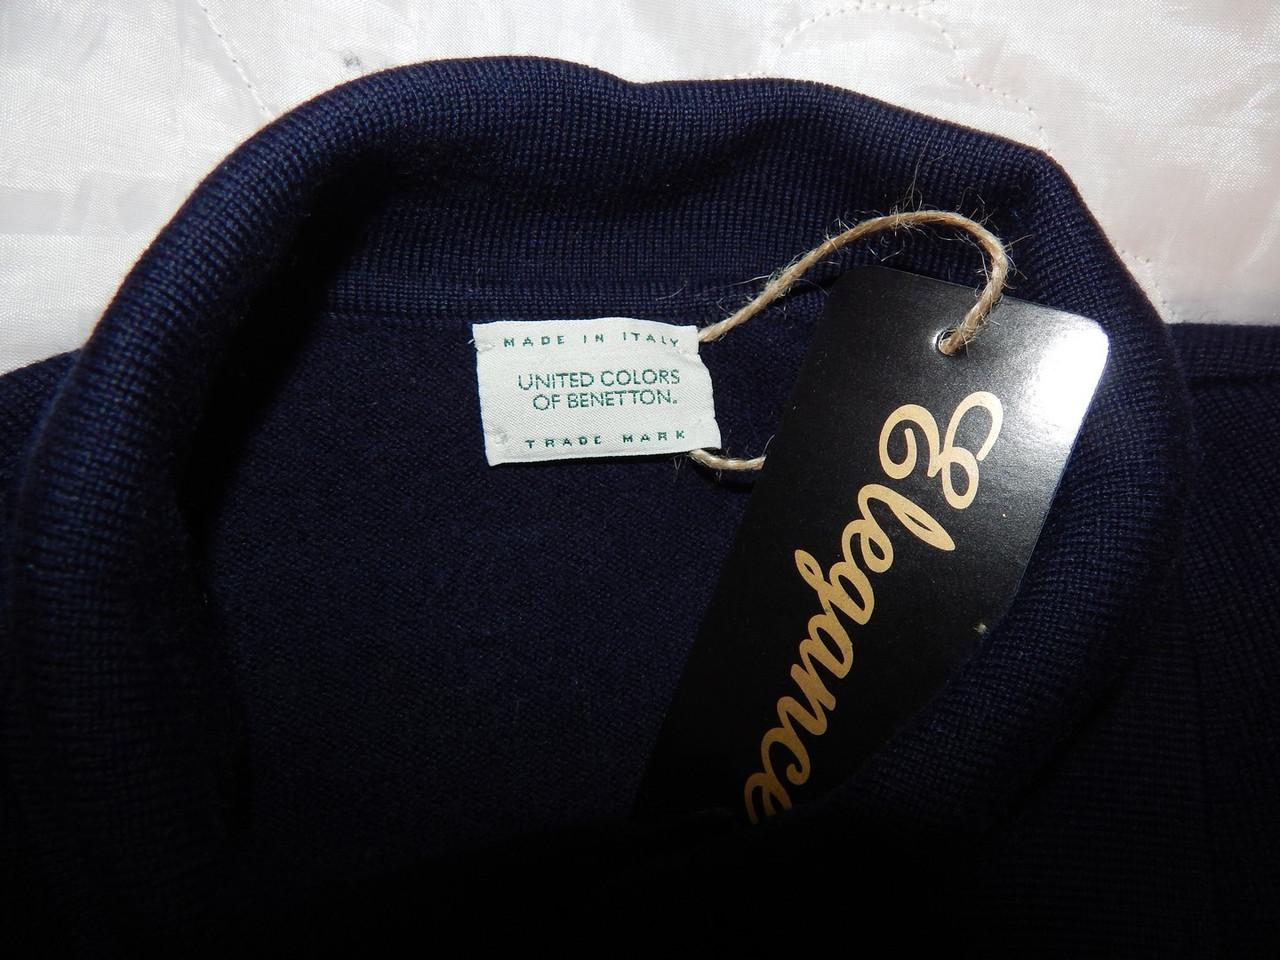 cab407579 ... Свитер мужской фирменный United colors of Benetton сток р.48 275см 5